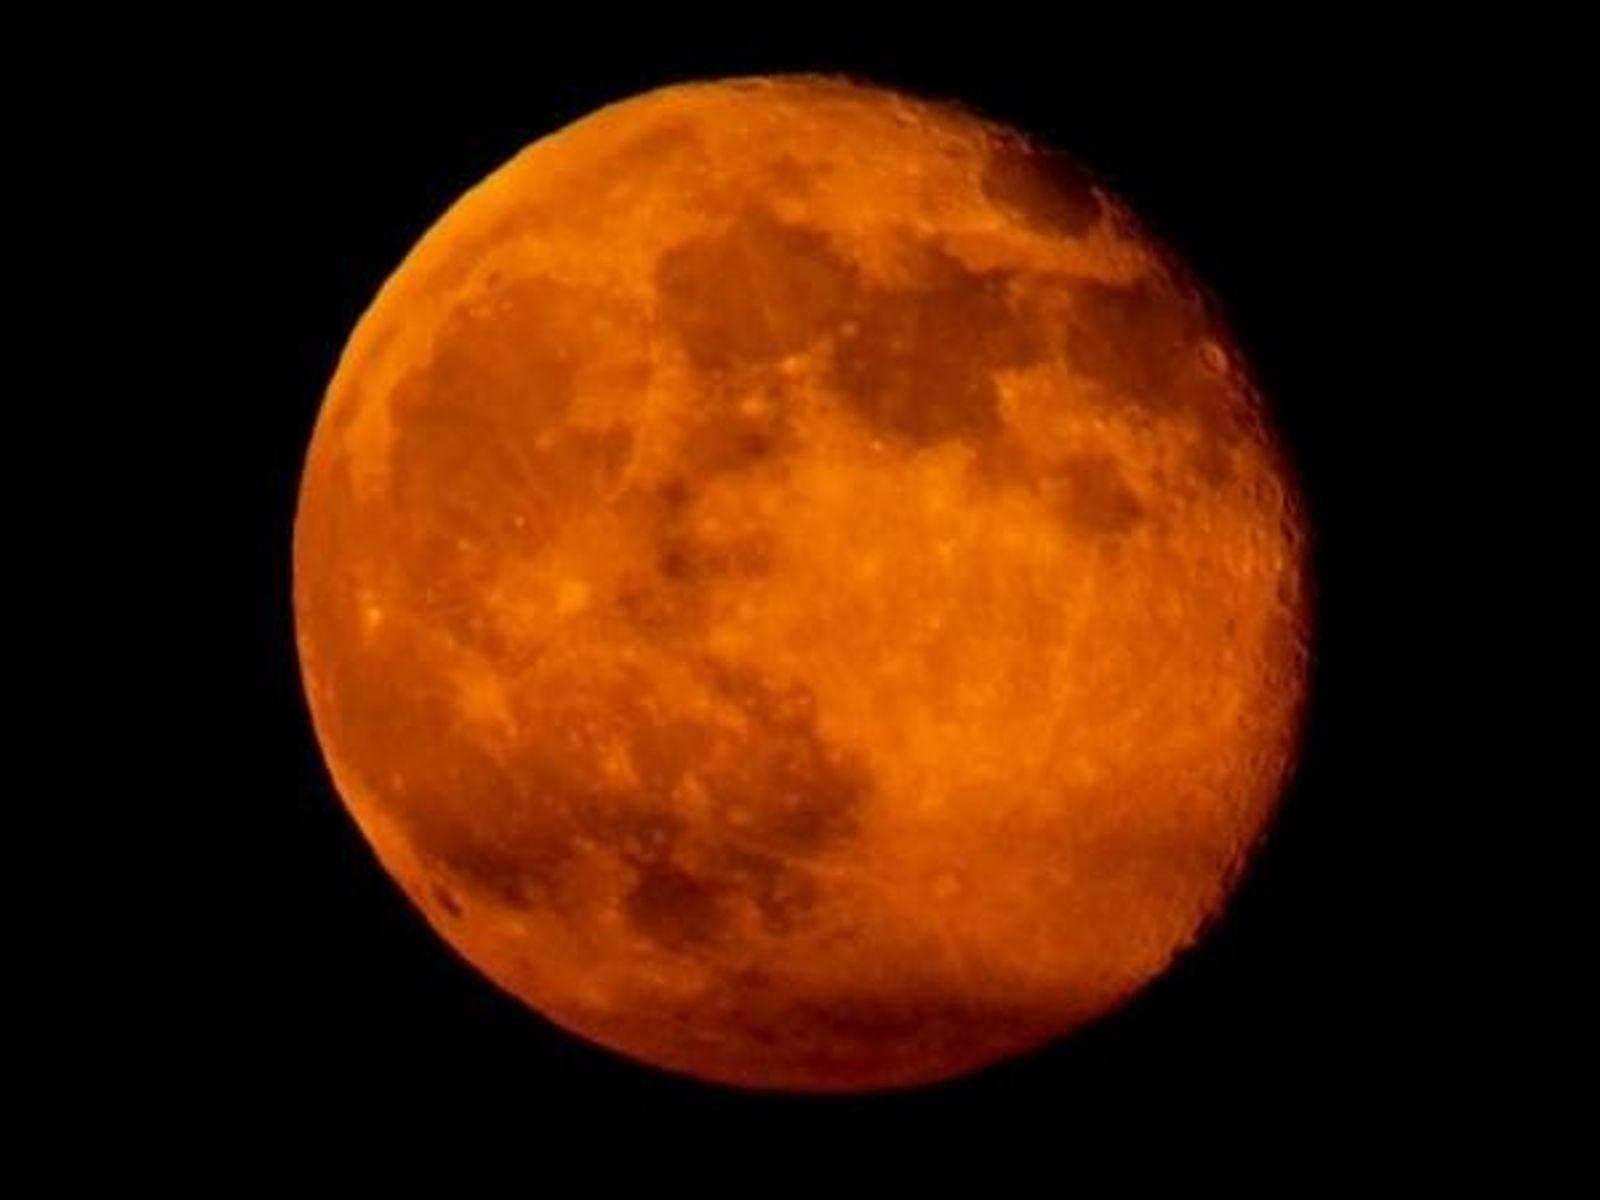 Súper-mega Luna - 14 de noviembre